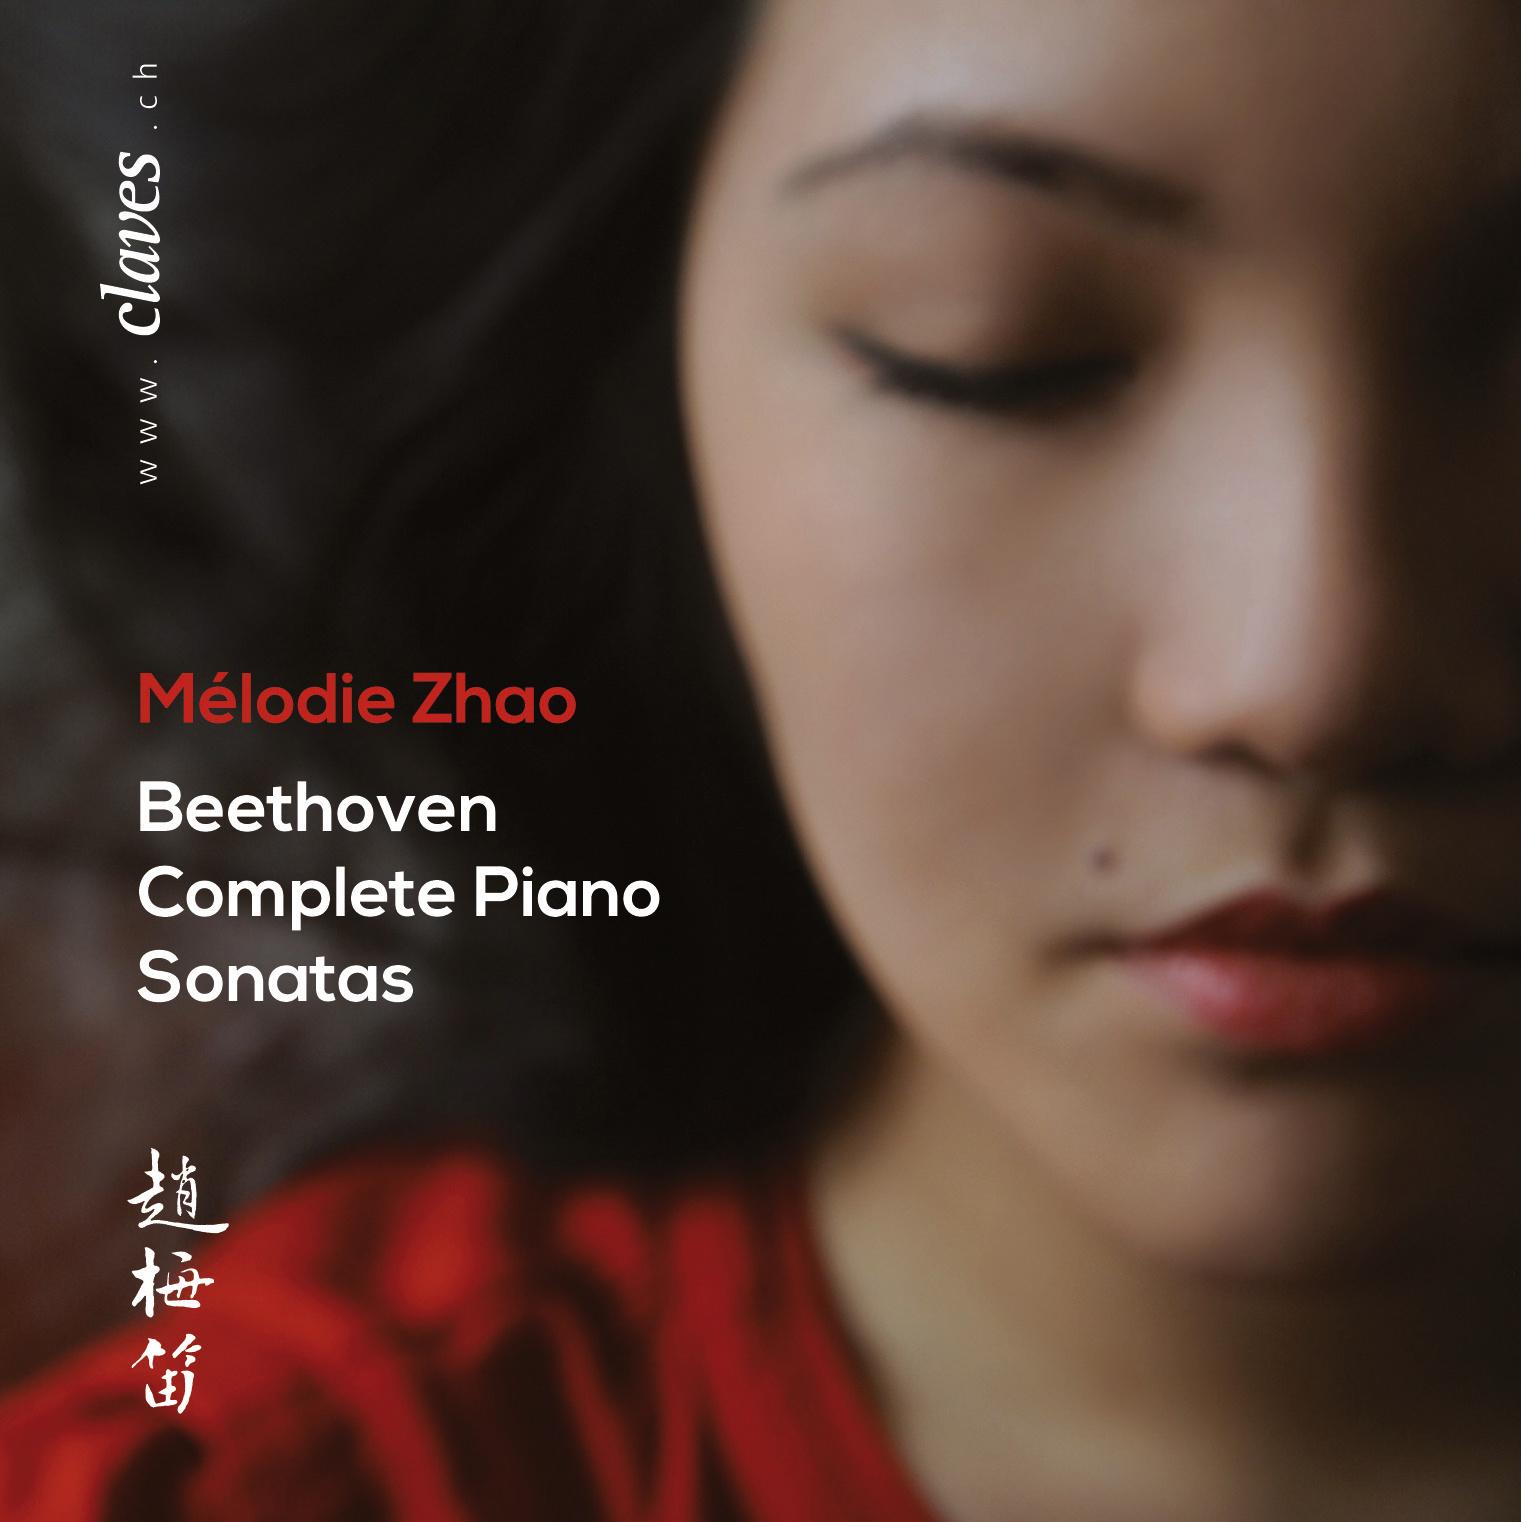 Mélodie Zhao - Complete Beethoven Piano Sonatas